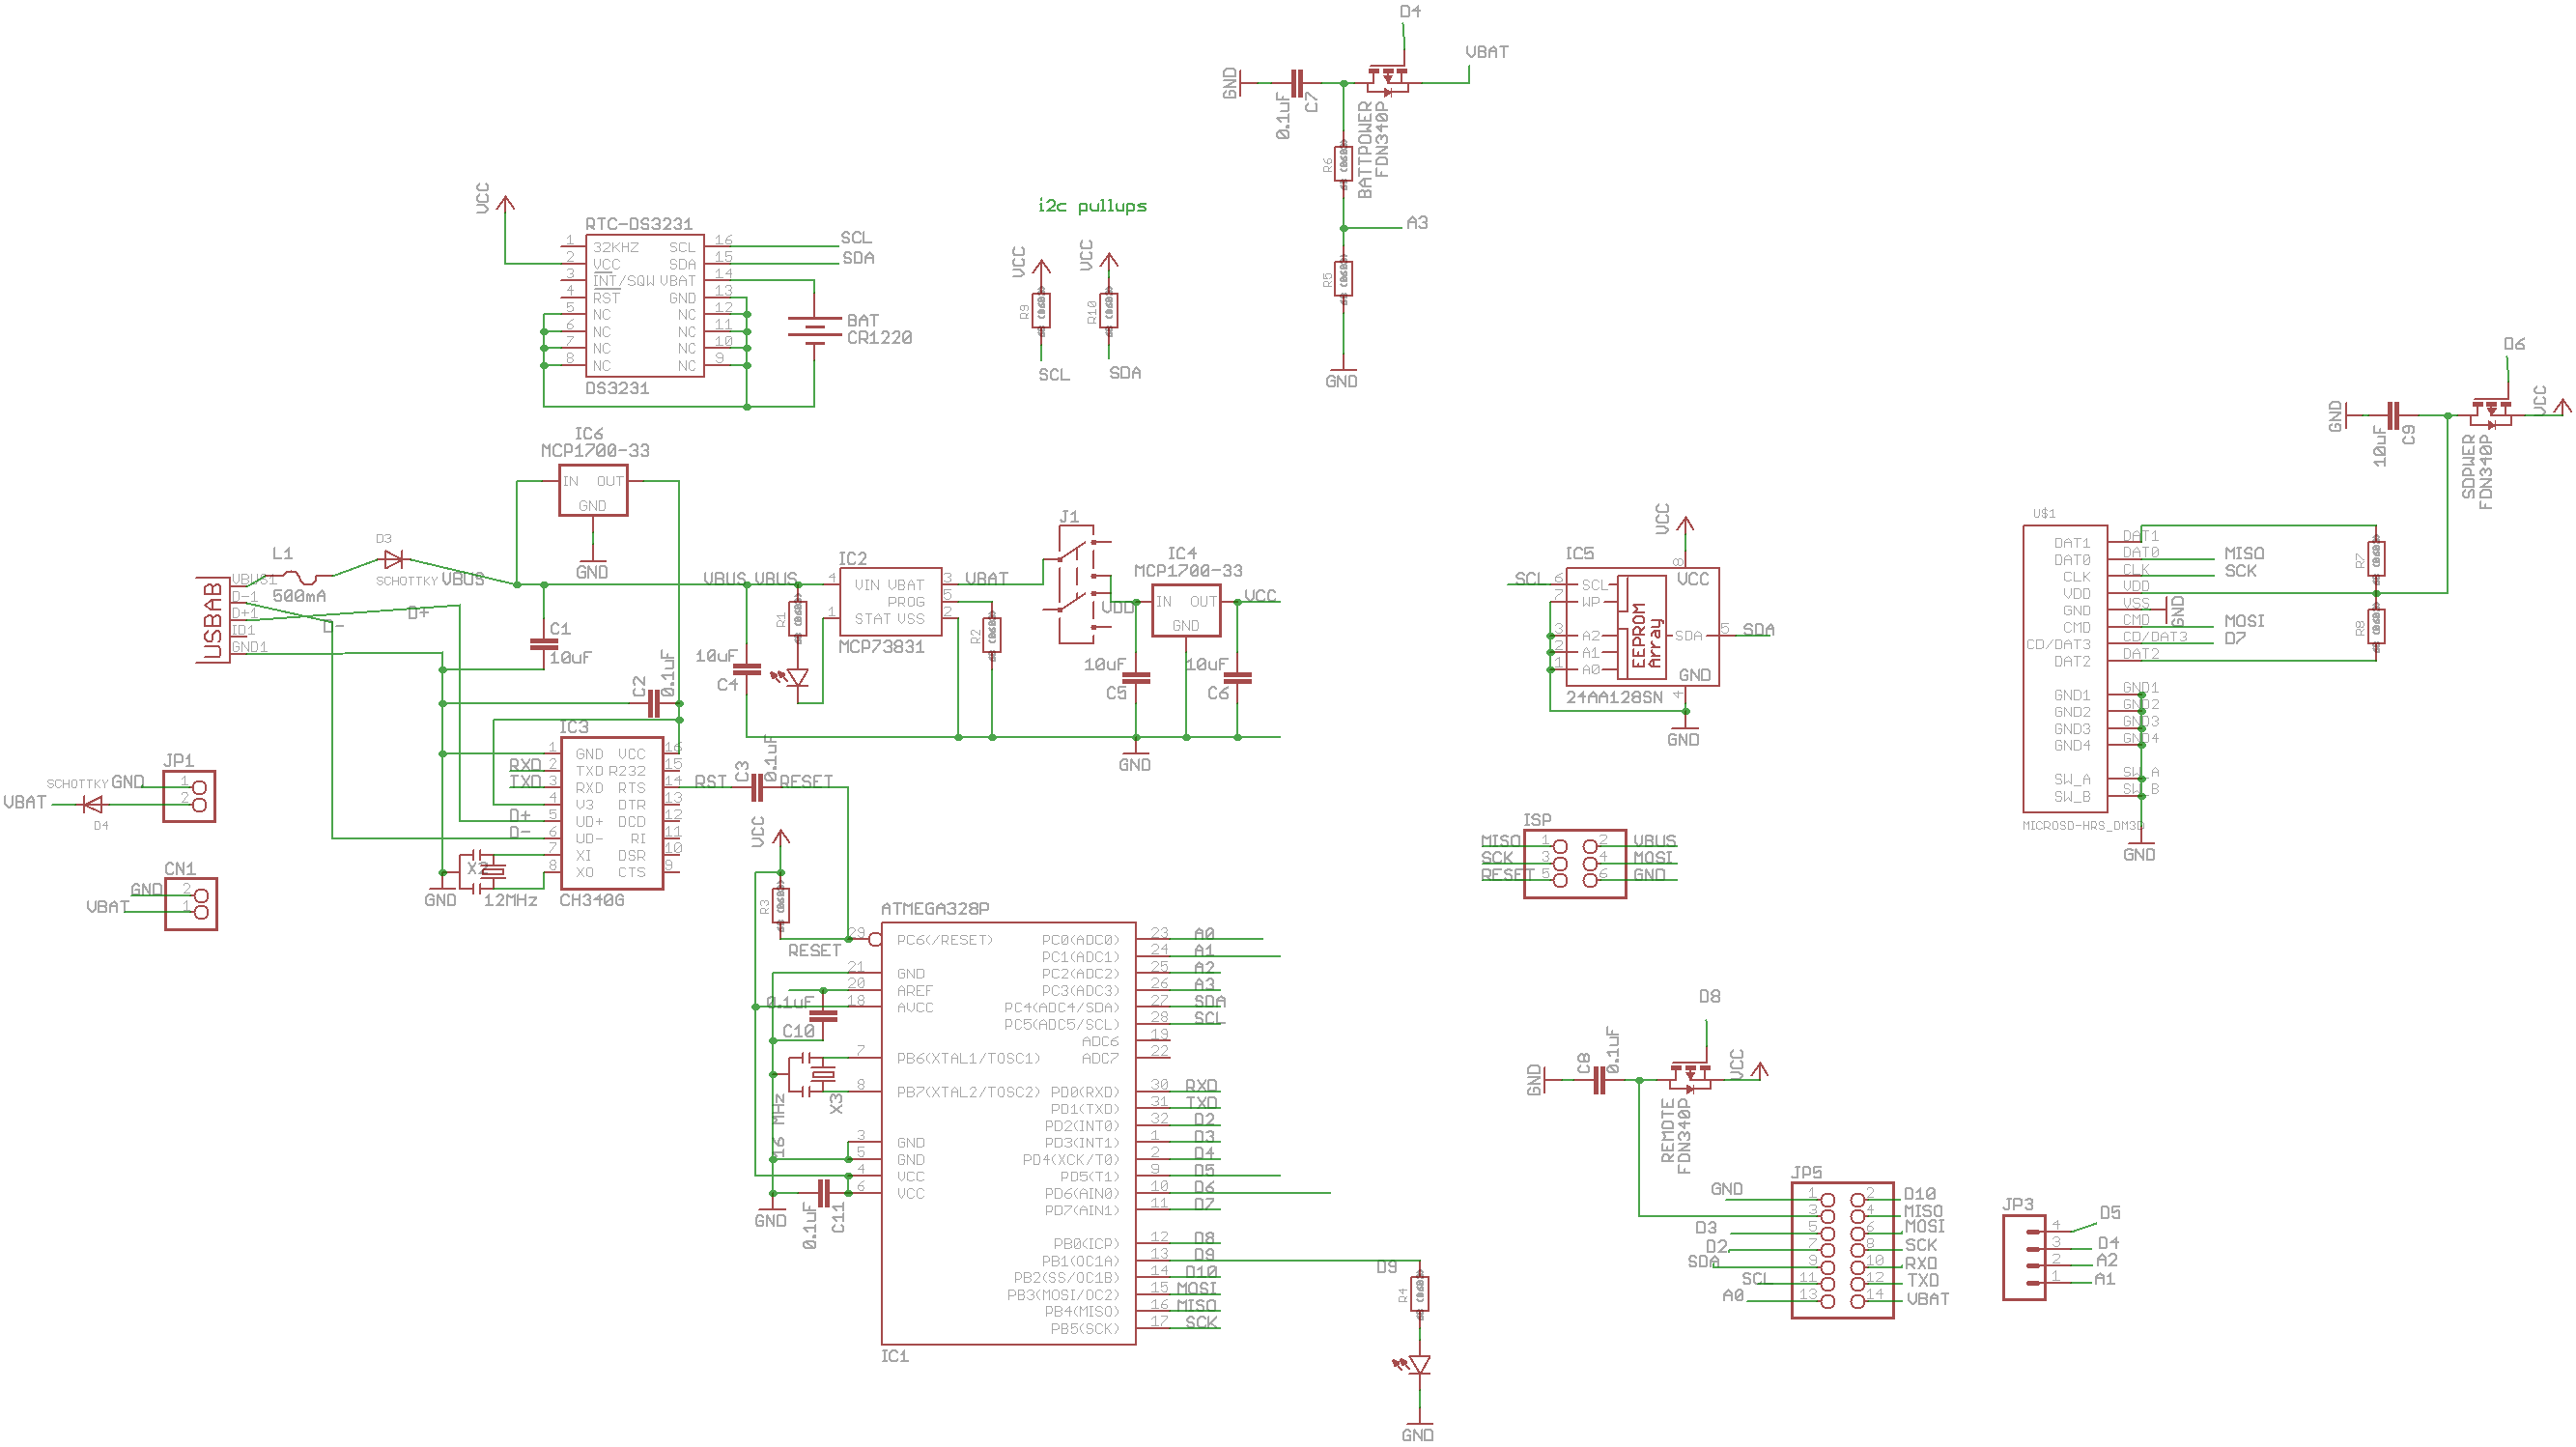 public lab  riffle 0 1 1 debugging